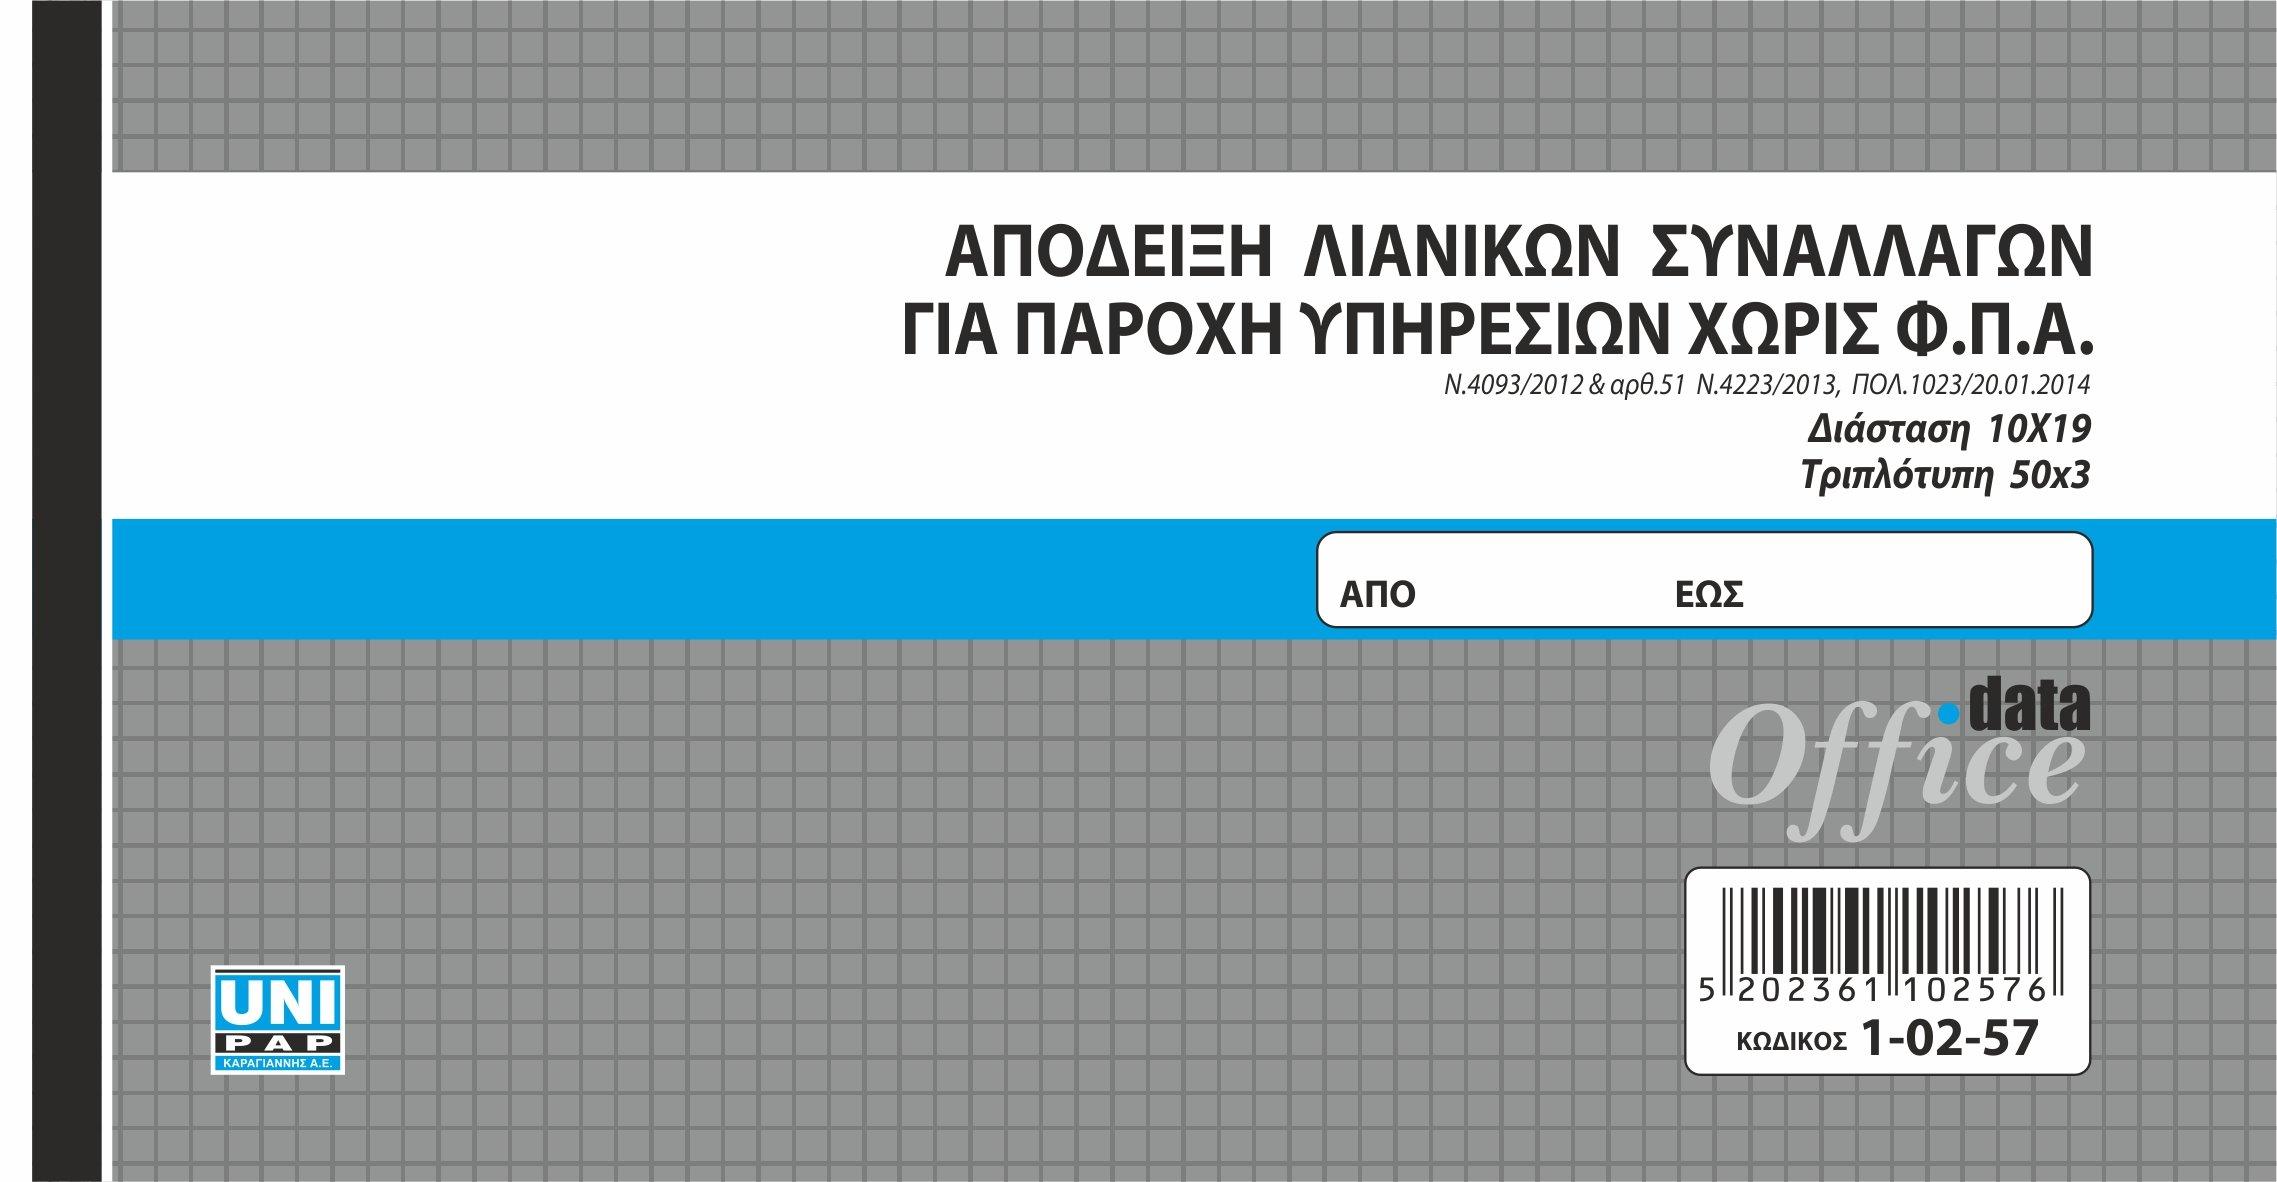 46a0742196 Απόδειξη Λιανικών Συναλλαγών για Παροχή Υπηρεσιών χωρίς ΦΠΑ 3τυπη ...